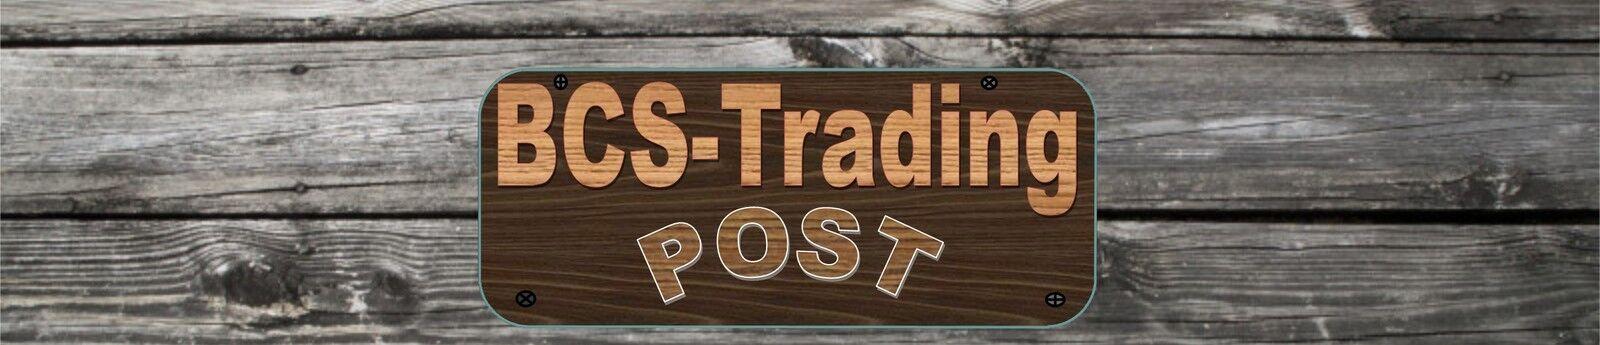 bcs-trading